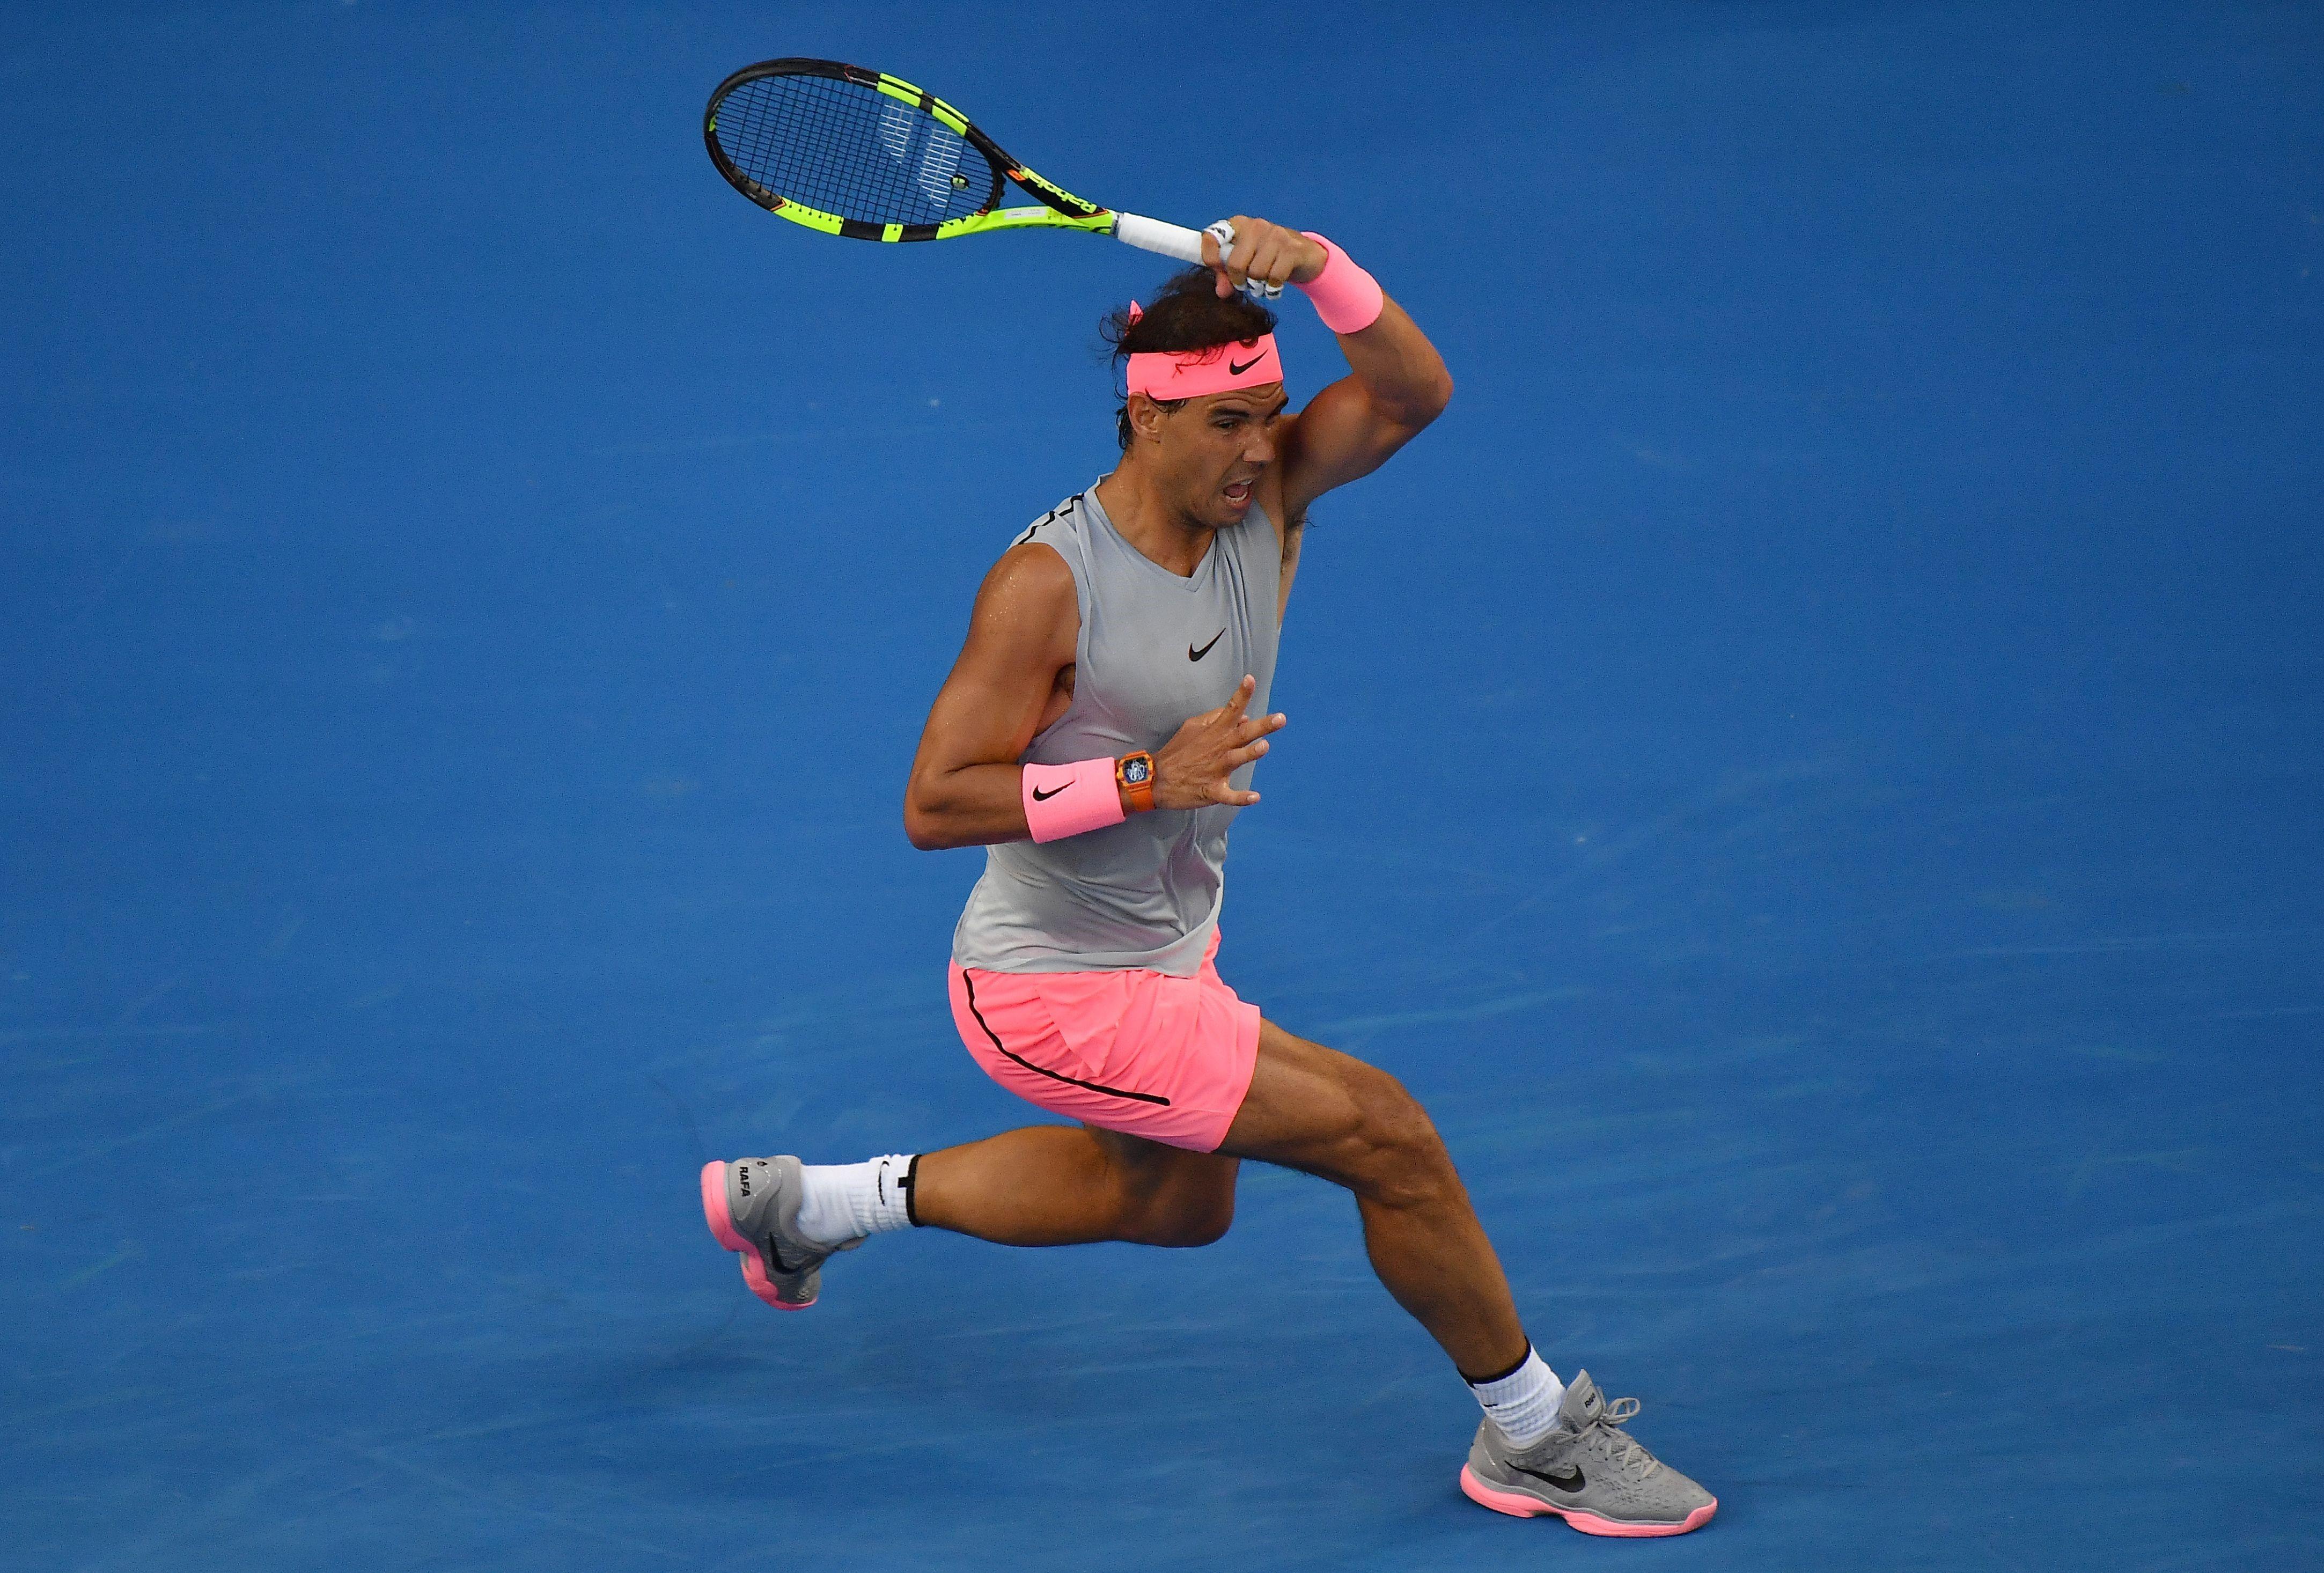 Rafael Nadal lors de l'Open d'Australie 2018